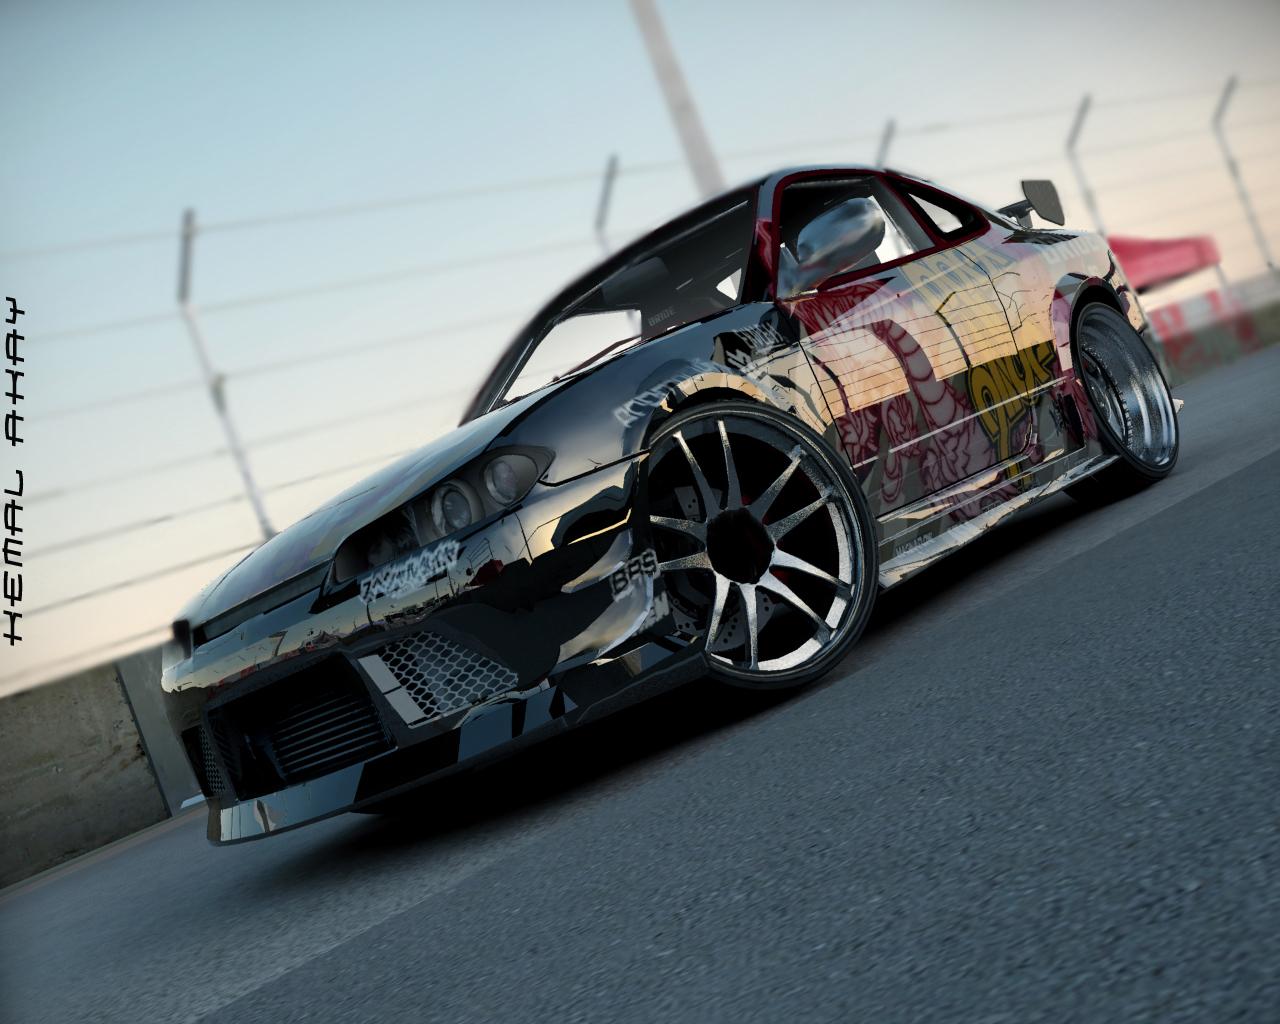 http://3.bp.blogspot.com/-Pb6Ohva0Buw/TVj5eie8Q7I/AAAAAAAAASI/H1cJCnpsxx0/s1600/Nissan_Silvia_S15_by_kemalakay.jpg